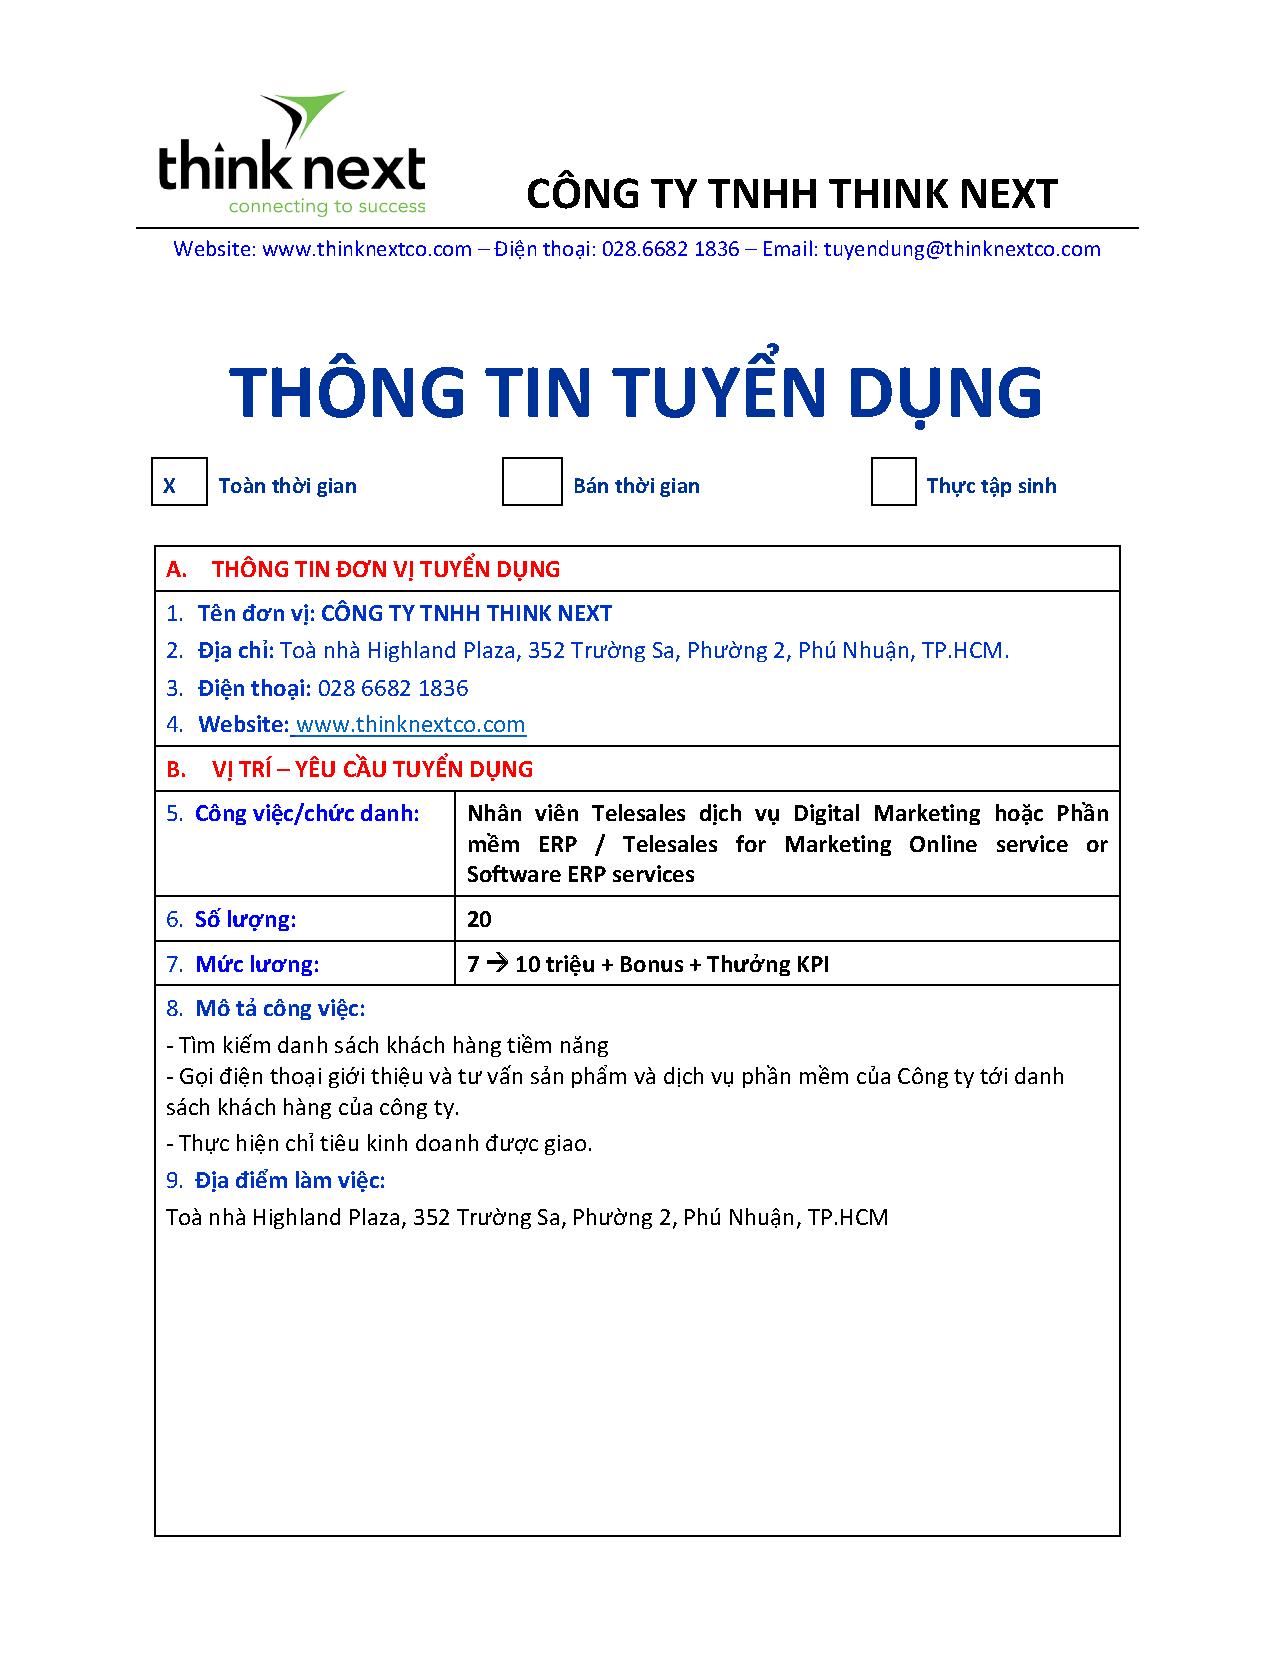 CTY THINK NEXT-THONG TIN TUYEN DUNG DOANH NGHIEP_Telesales Digital & ERP_Page_1